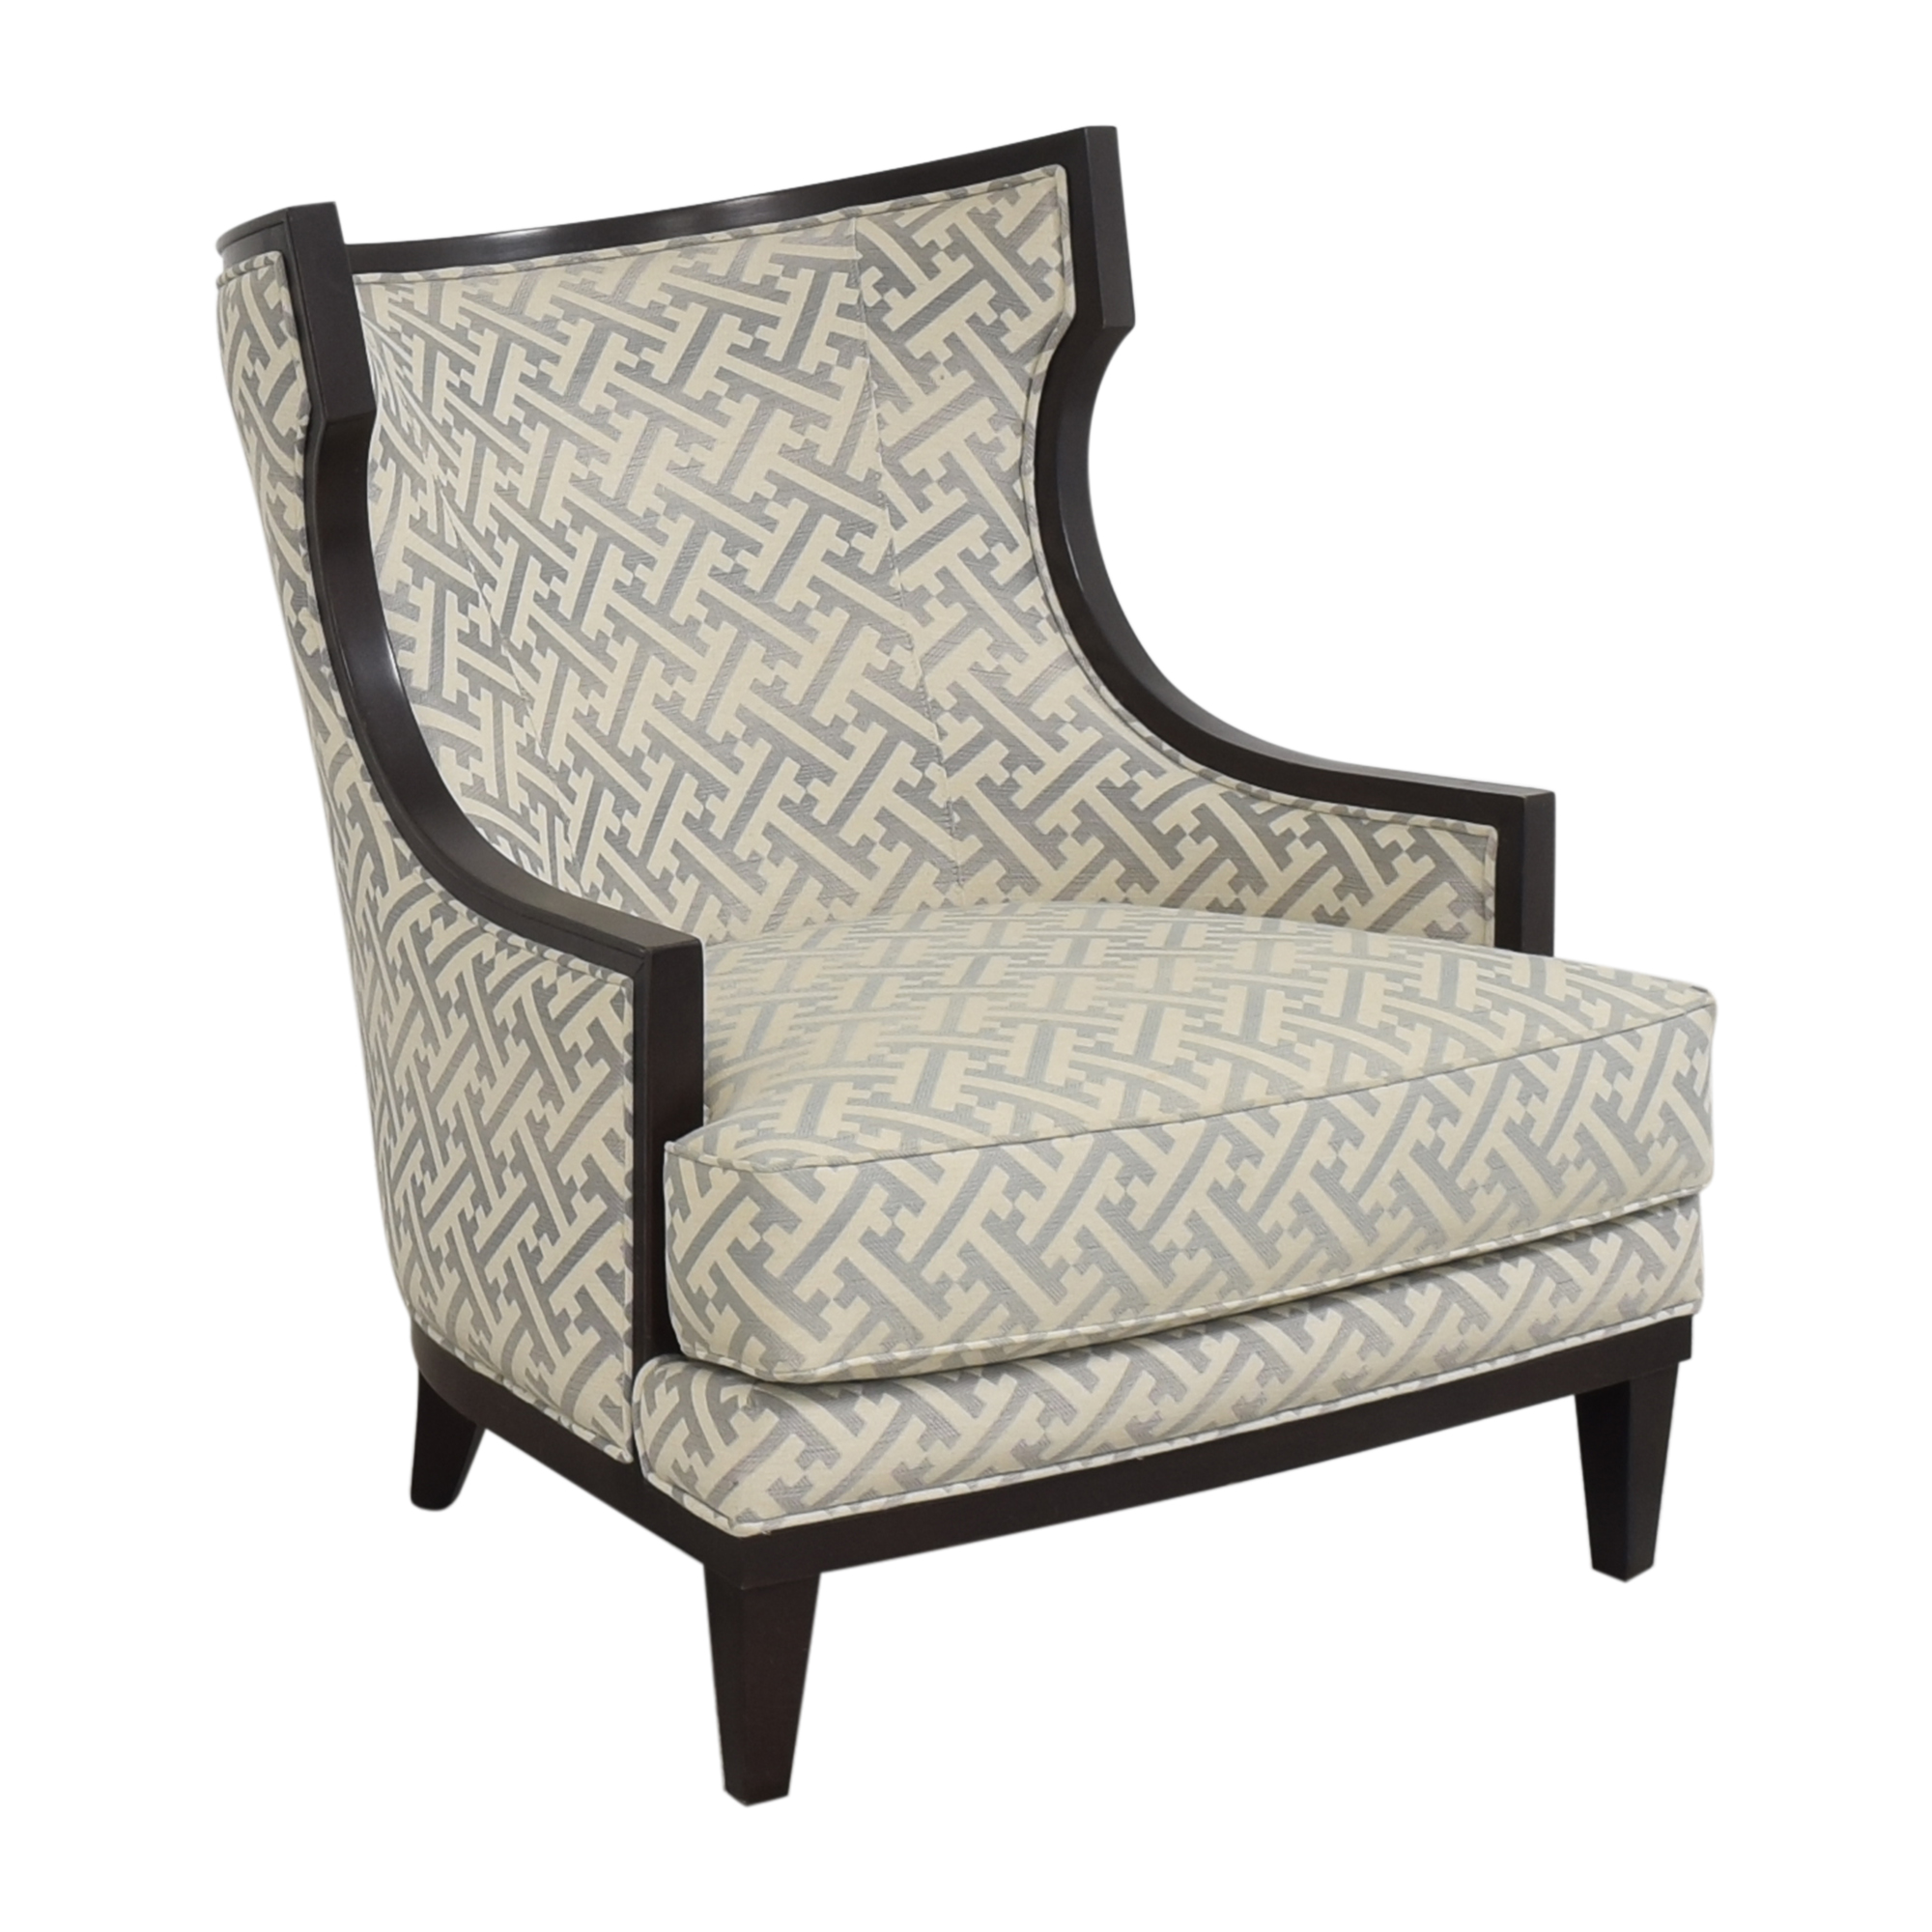 Ethan Allen Ethan Allen Corrine Chair on sale